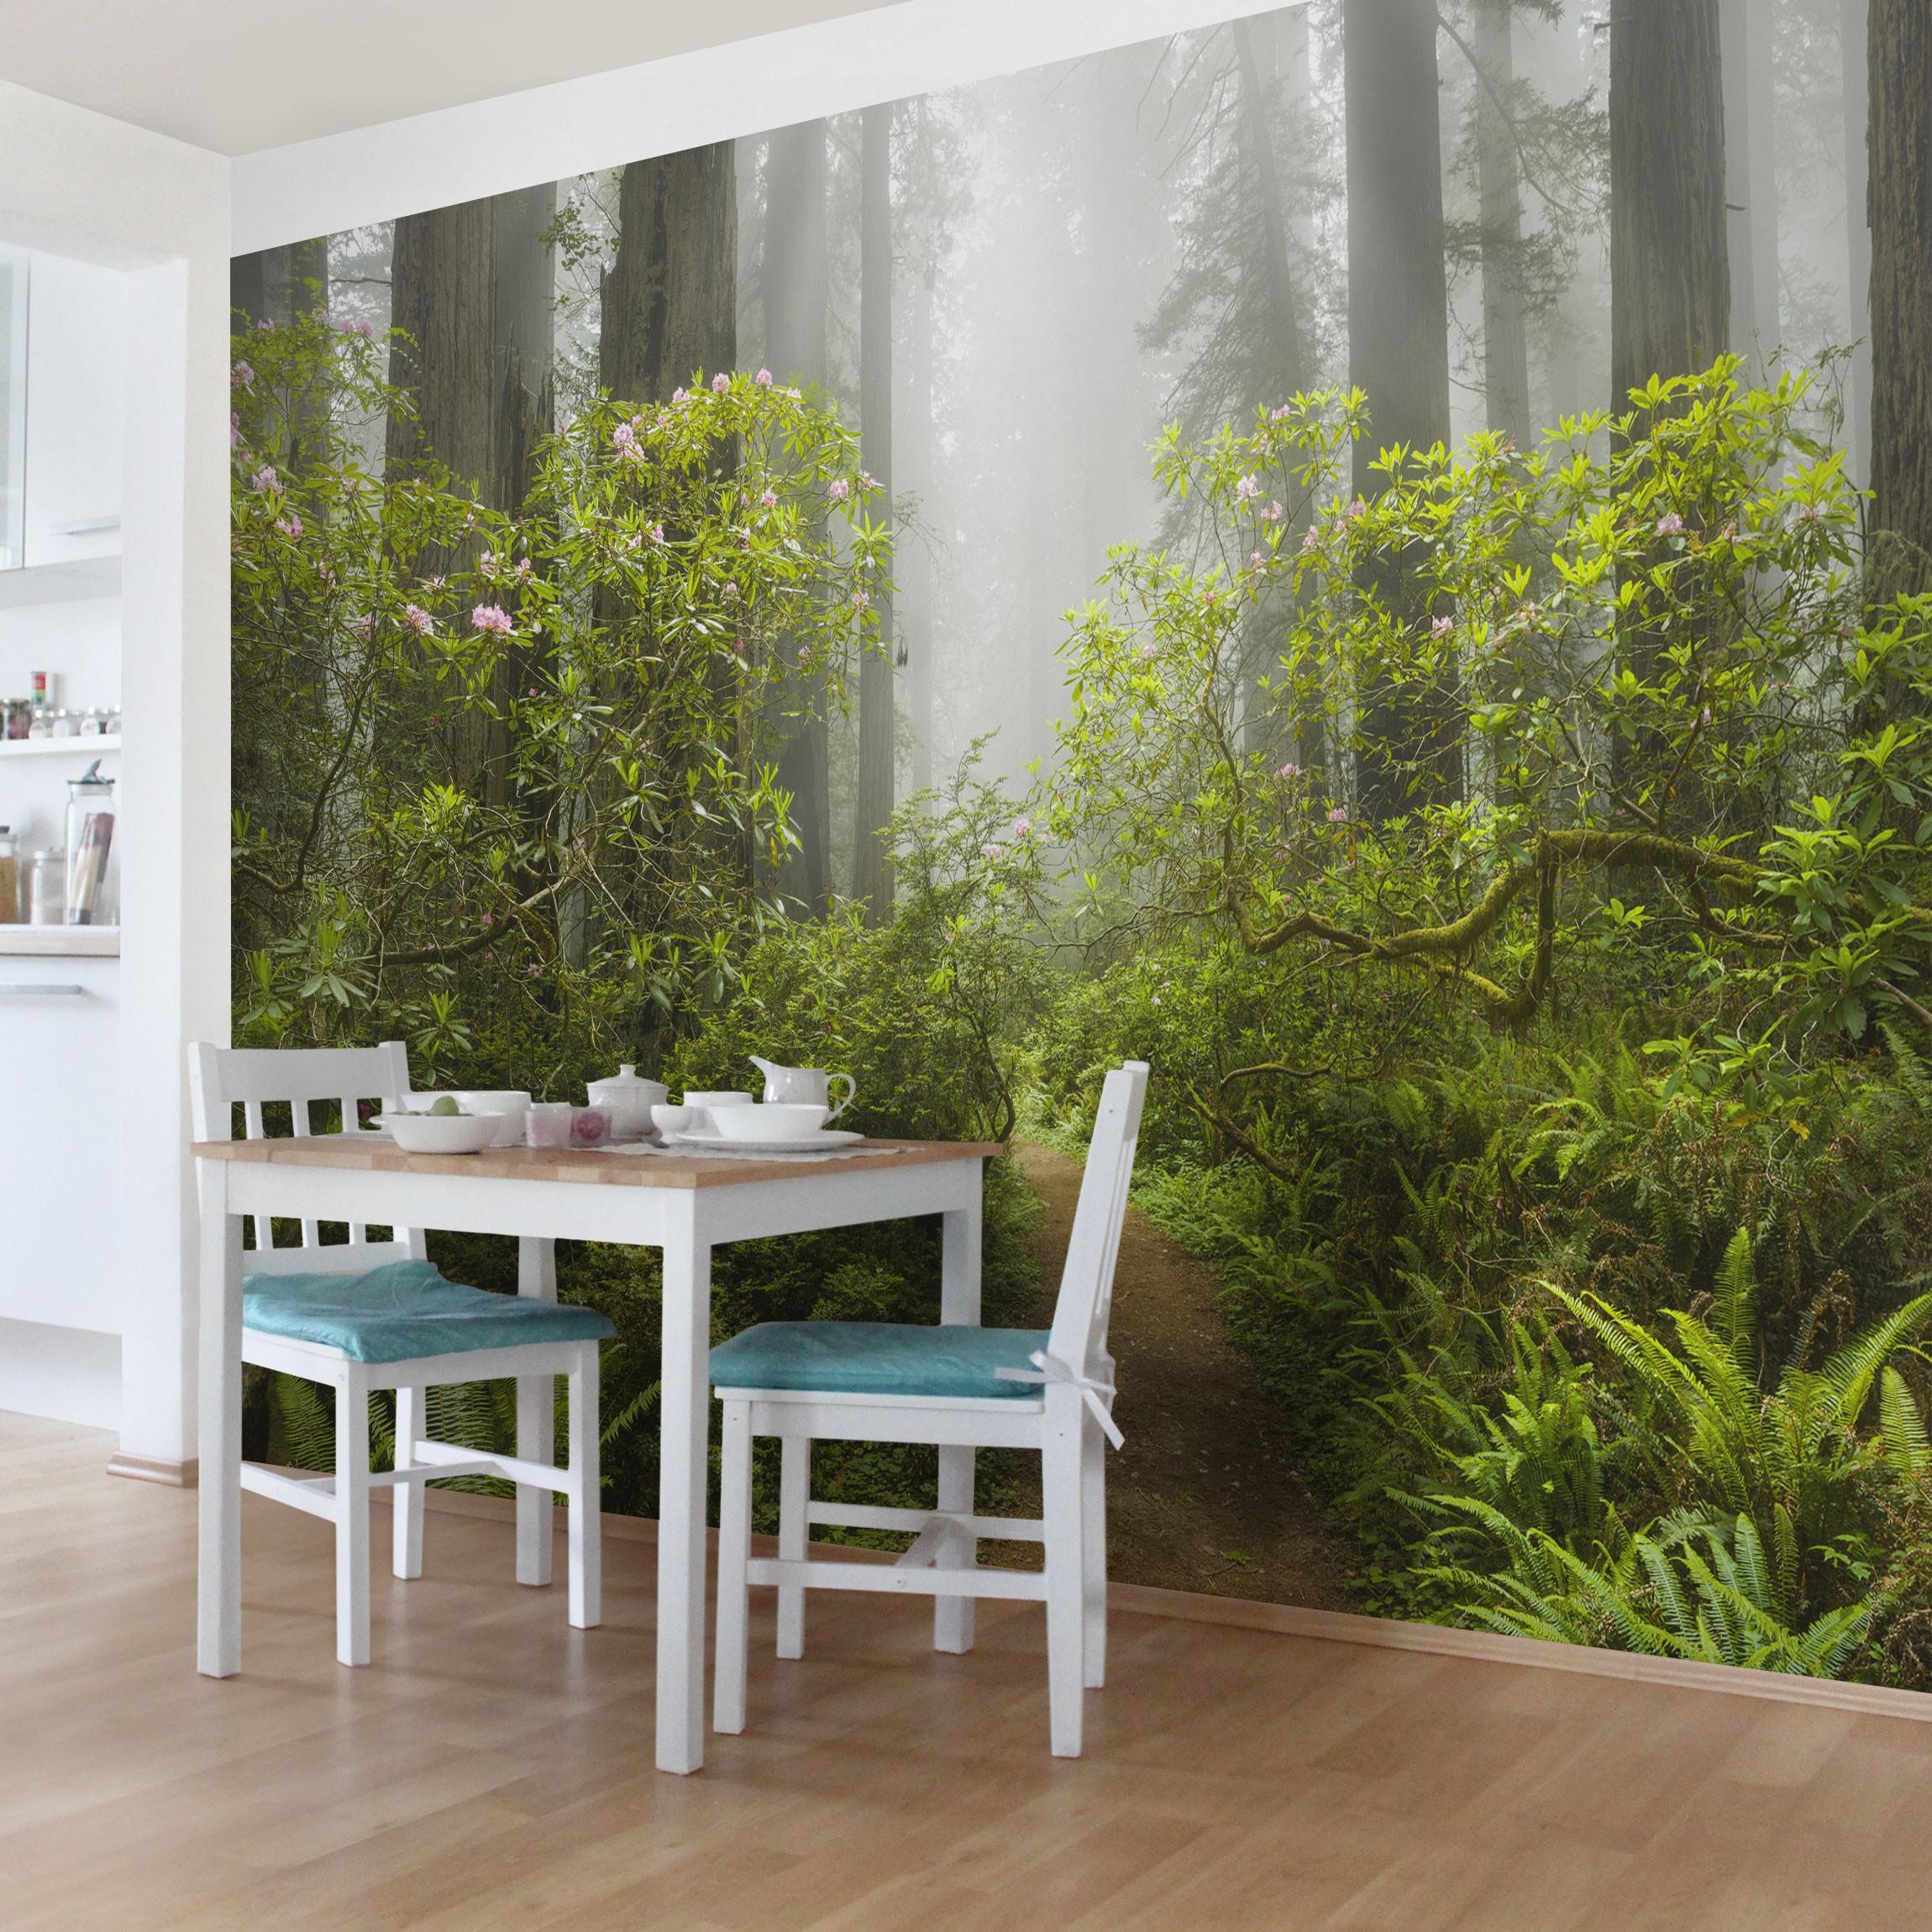 fototapete wald nebliger waldpfad selbstklebende vinyltapete. Black Bedroom Furniture Sets. Home Design Ideas